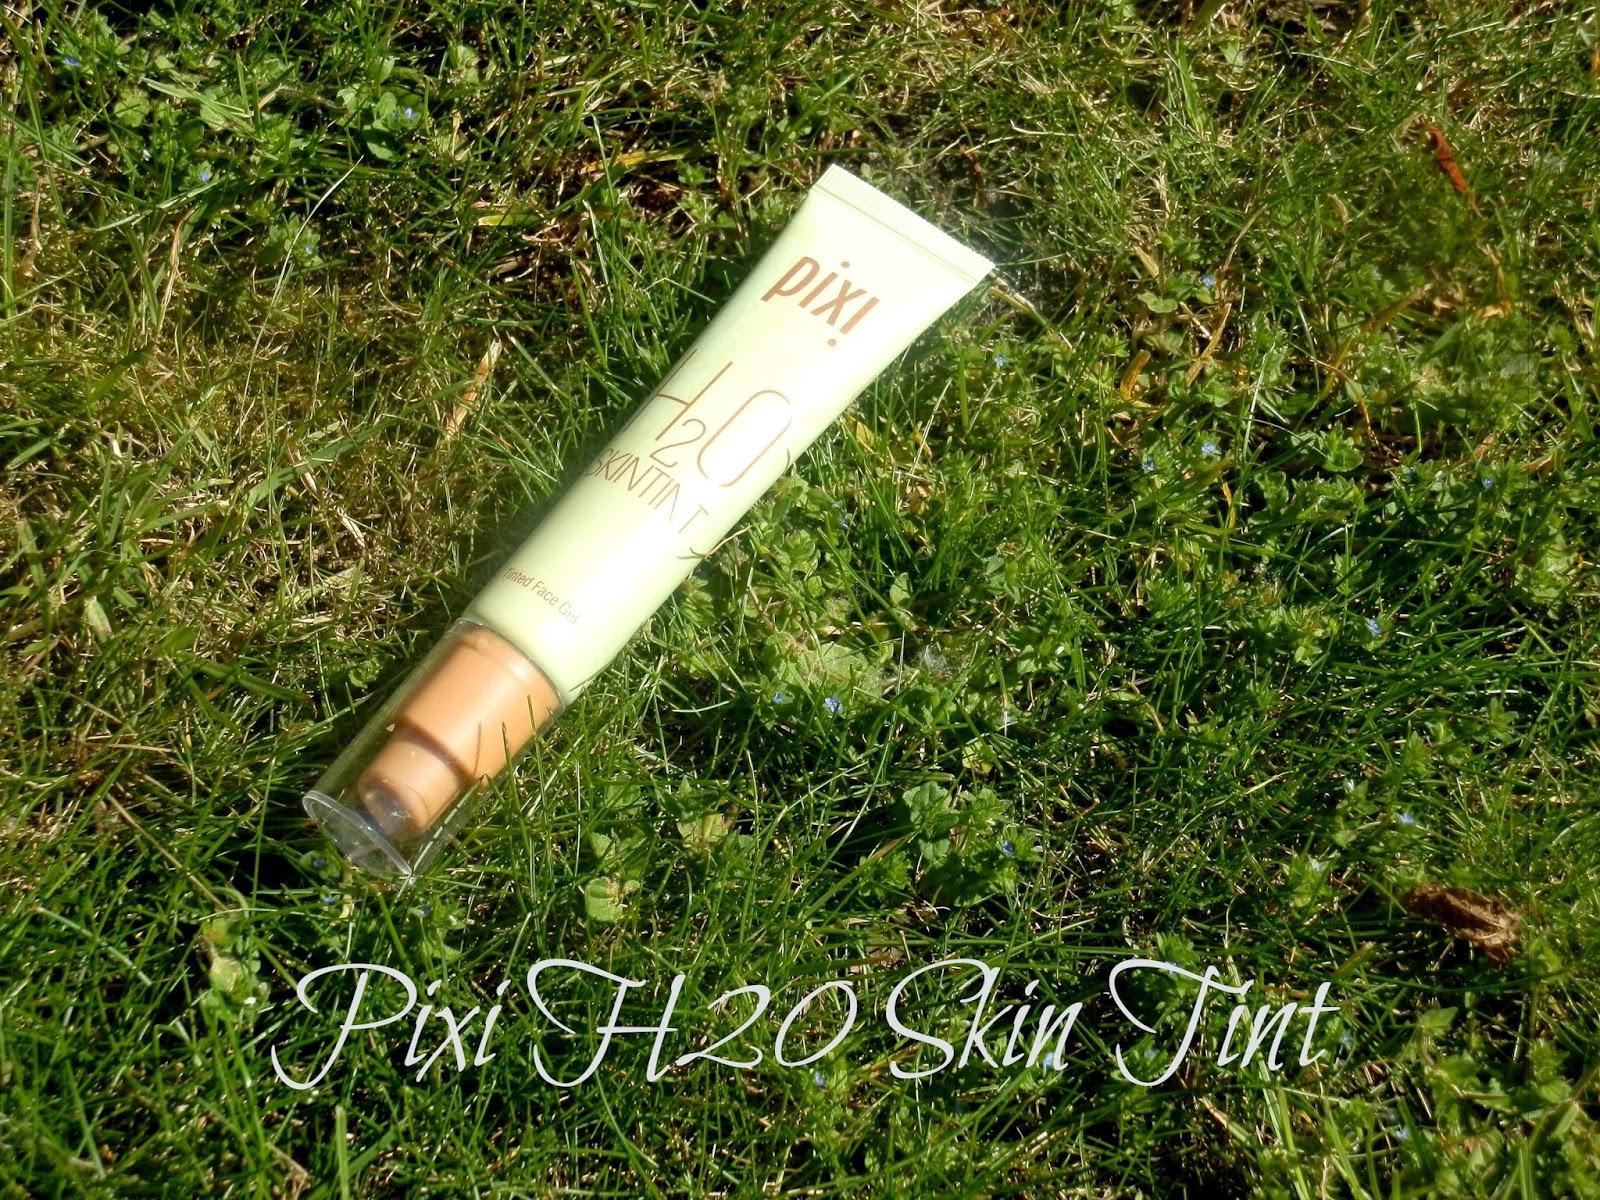 Pixi H20 Skin Tint